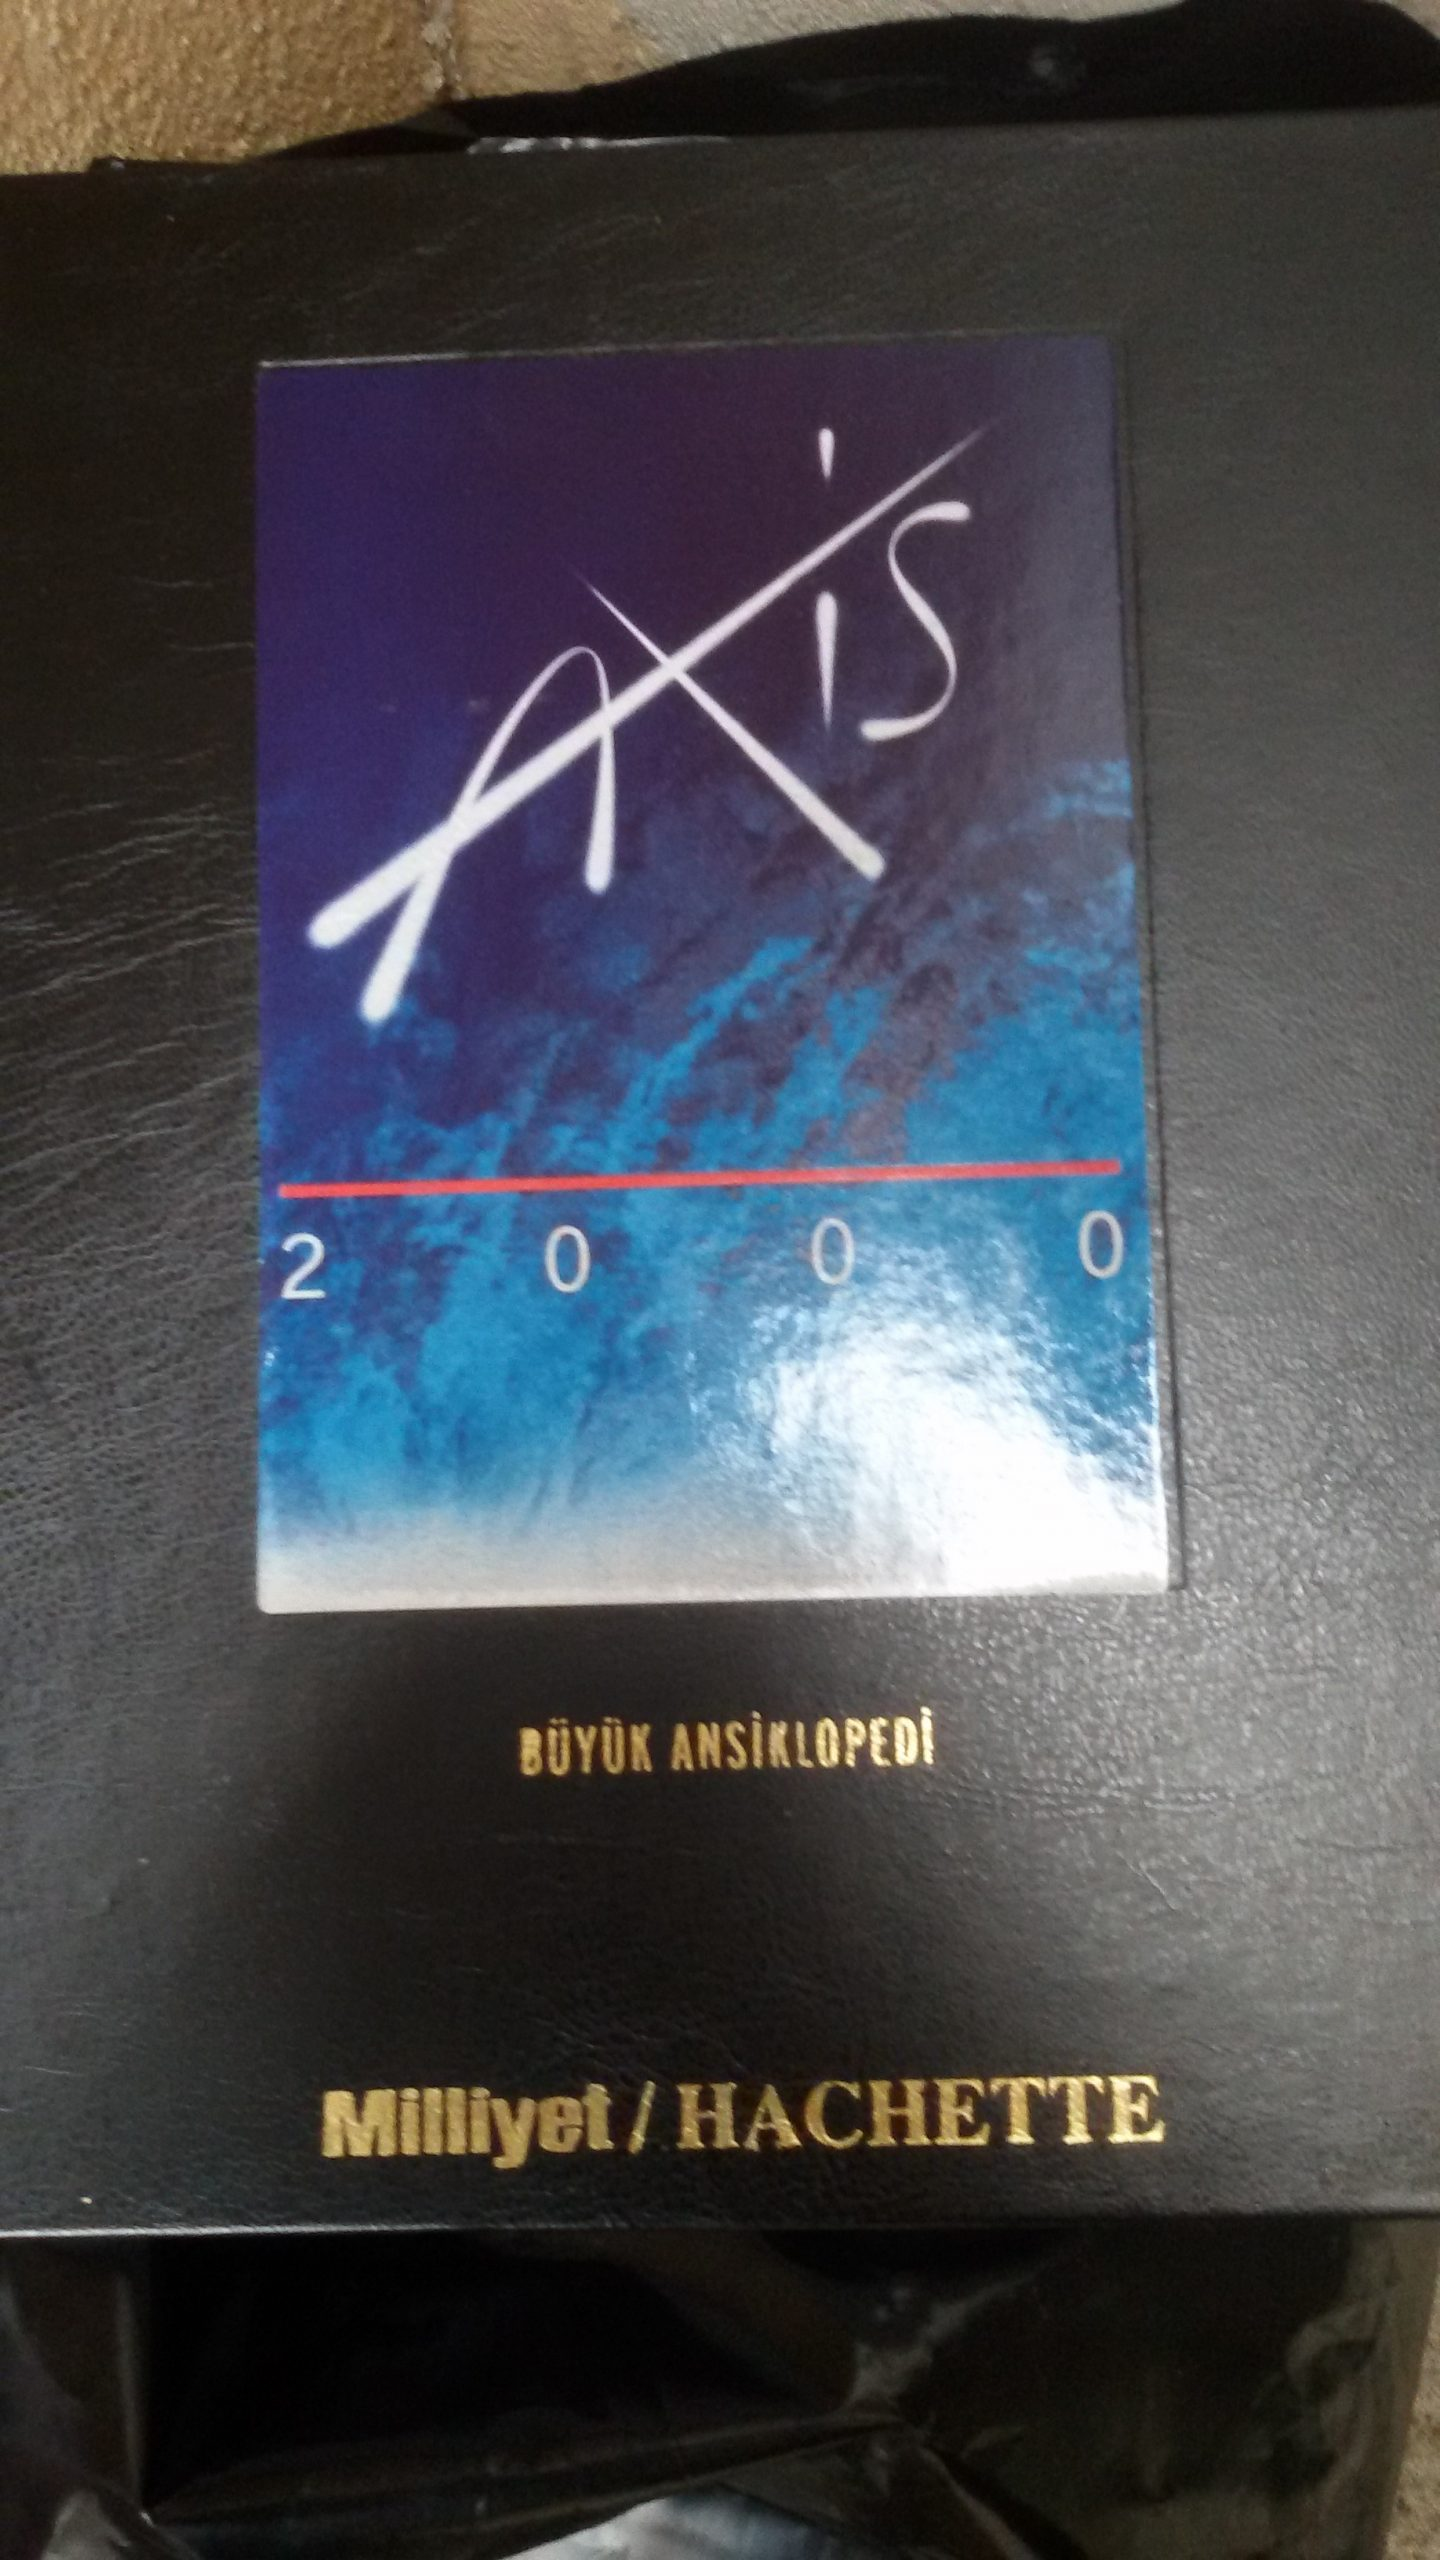 AXİS 2000/BÜYÜK ANSIKLOPEDİ/HACHETTE